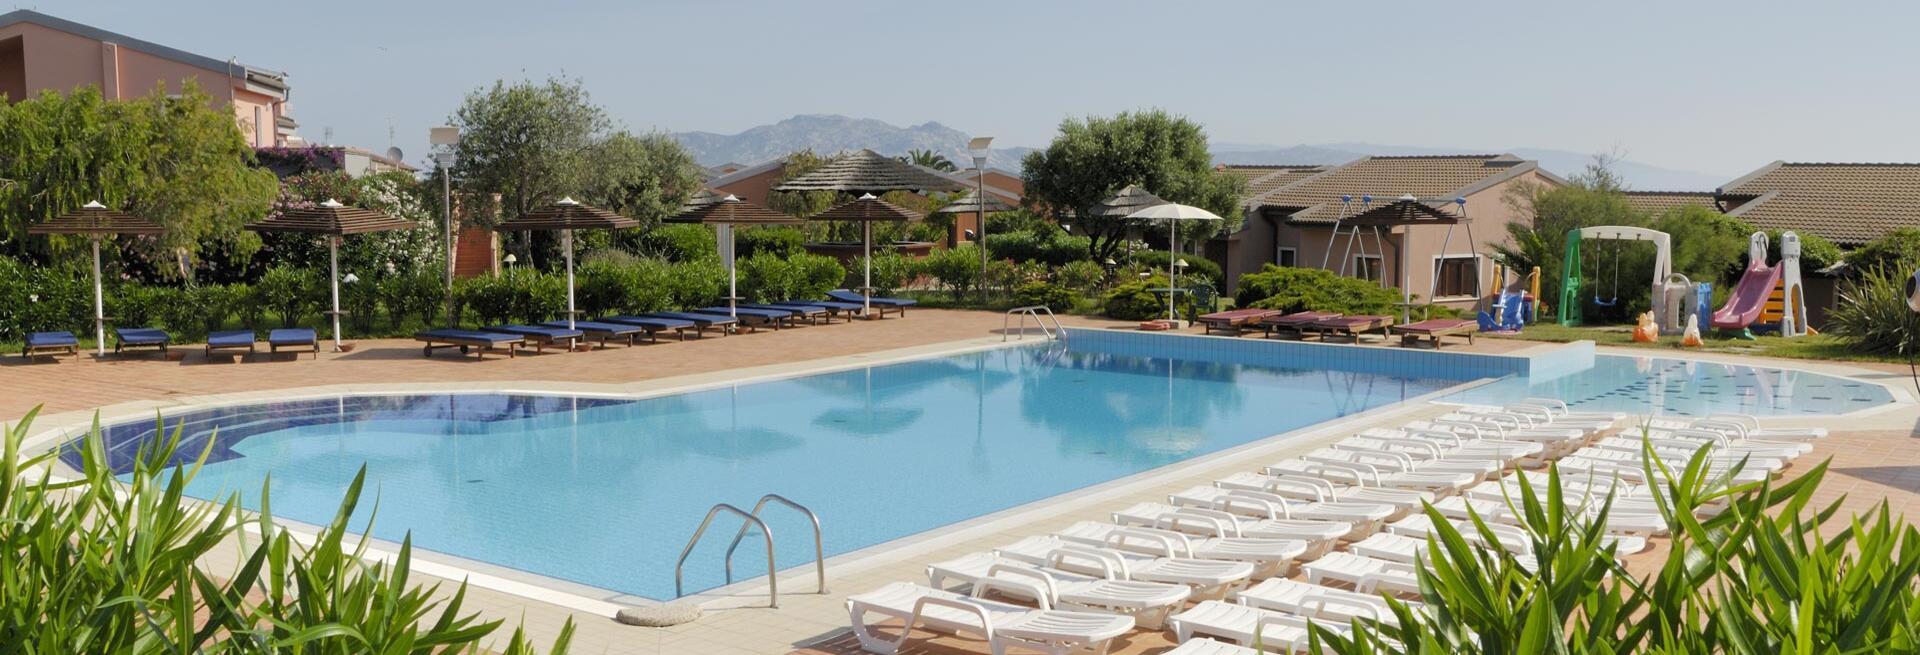 hotelcalarosa it villaggio 014